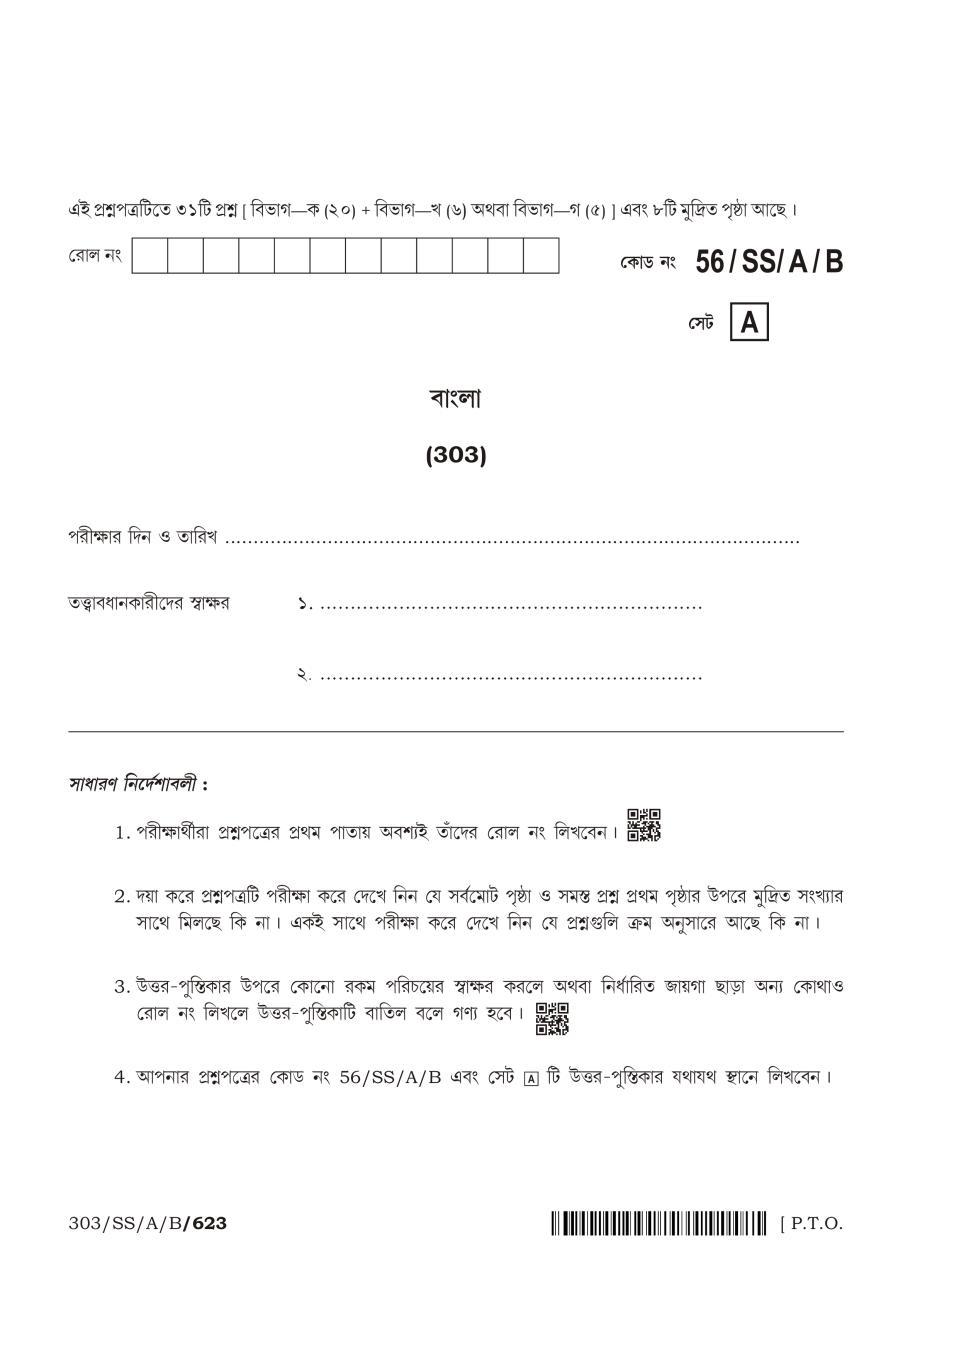 NIOS Class 12 Question Paper Apr 2018 - Bengali - Page 1